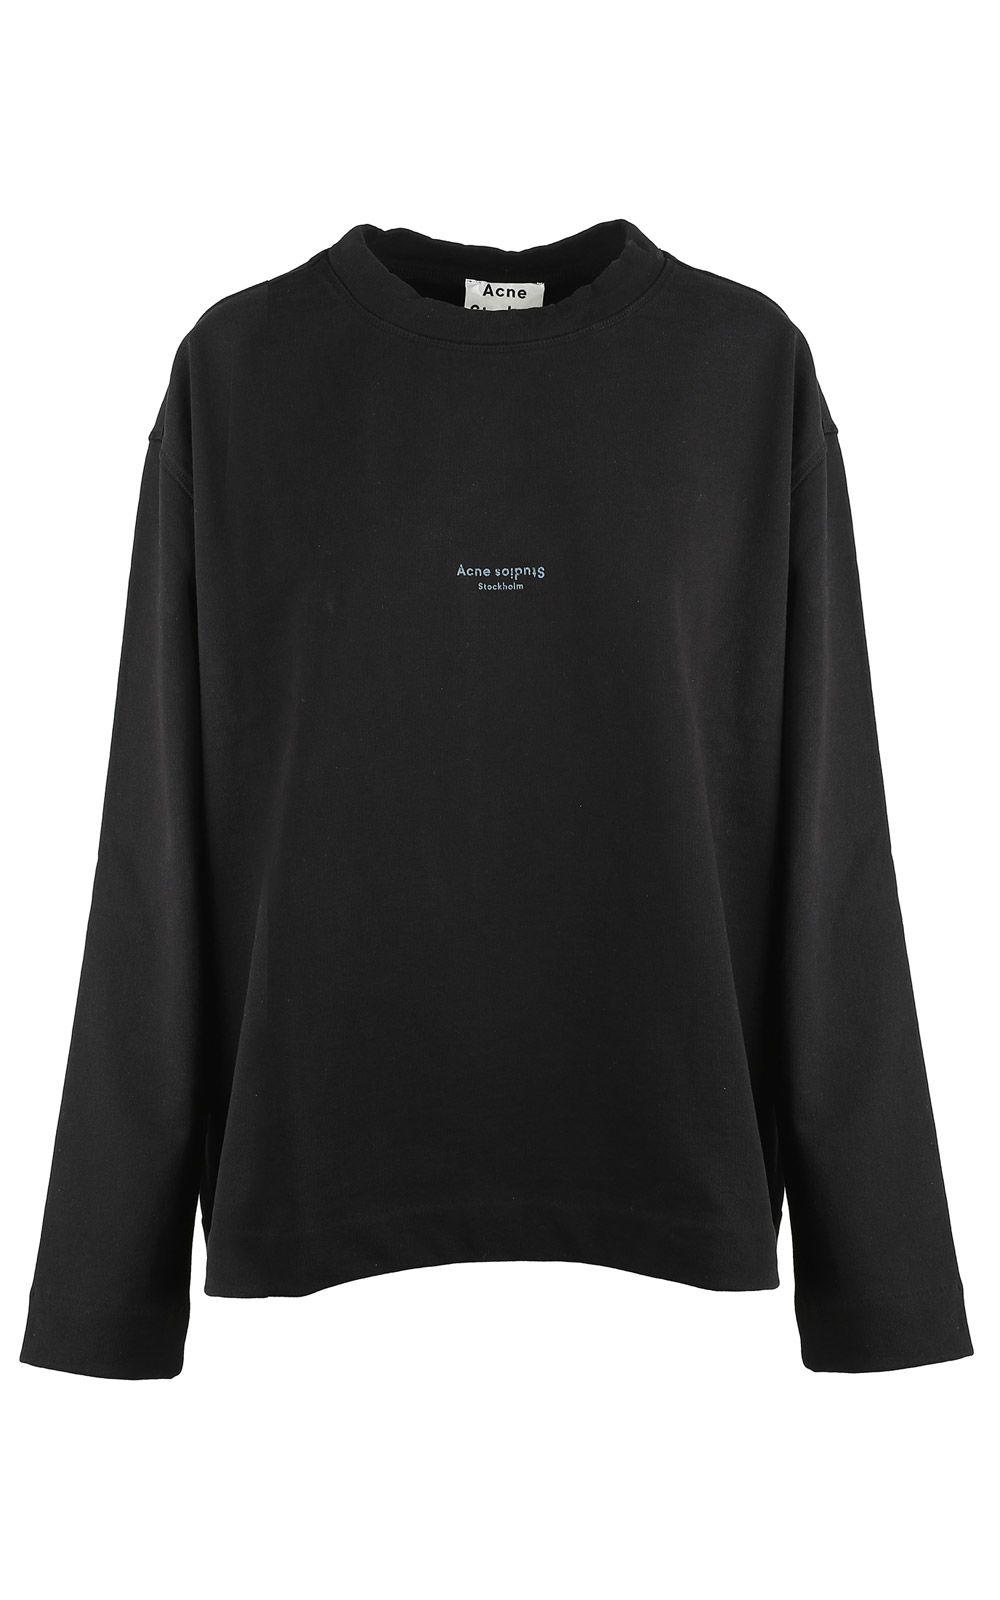 Acne Studios Lhynn Cotton-jersey Oversized Sweatshirt .jpg